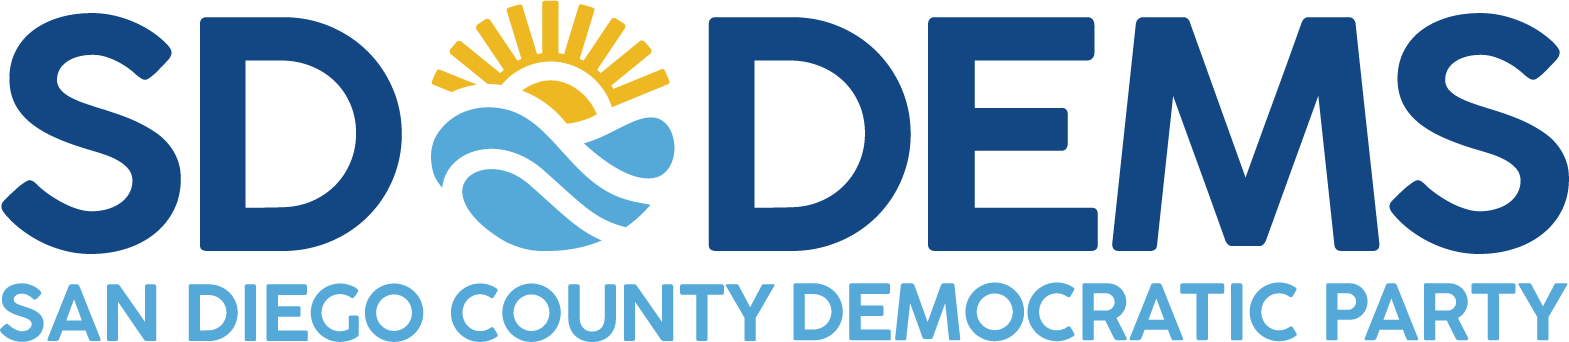 San Diego County Democratic Party (Federal Account)